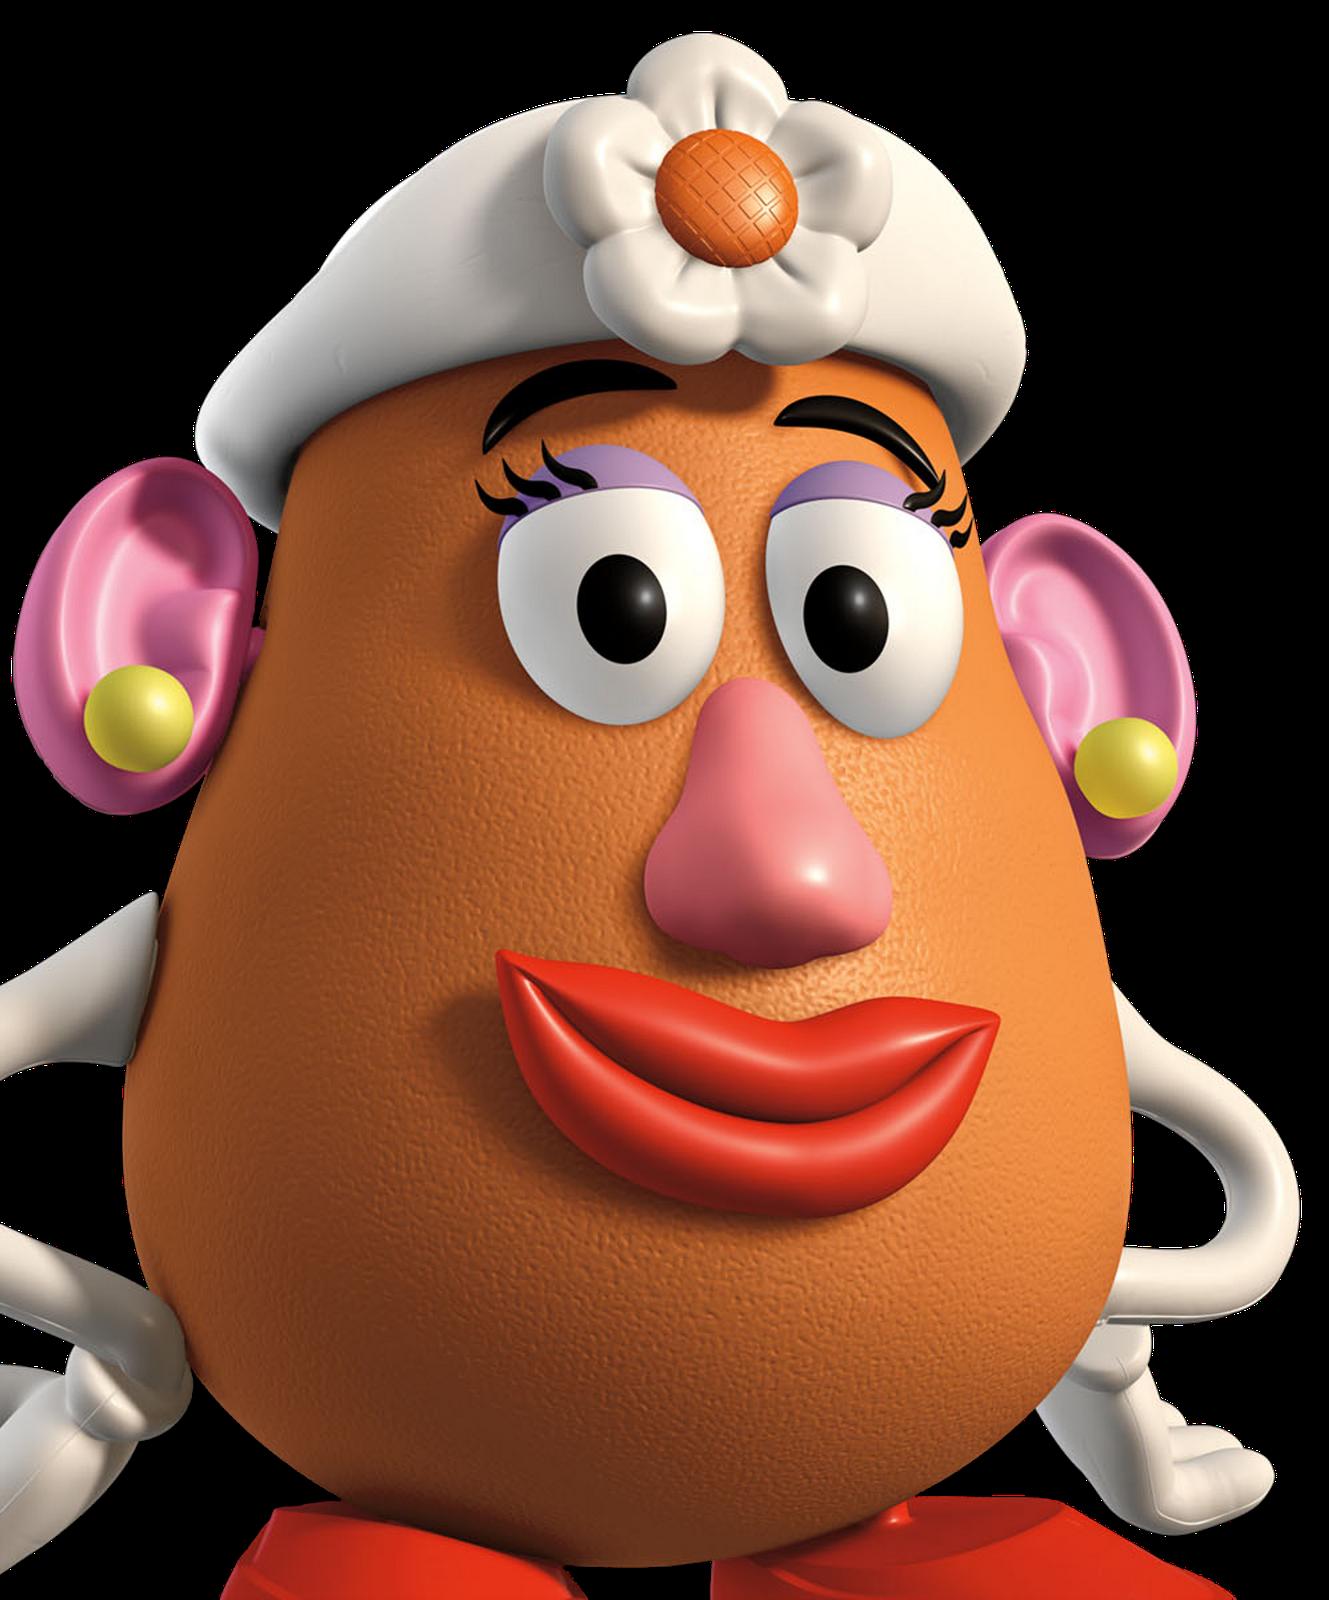 Toy Story Para Imprimir Imagenes Y Dibujos Para Imprimir Toy Story Characters Woody Toy Story Toy Story Halloween